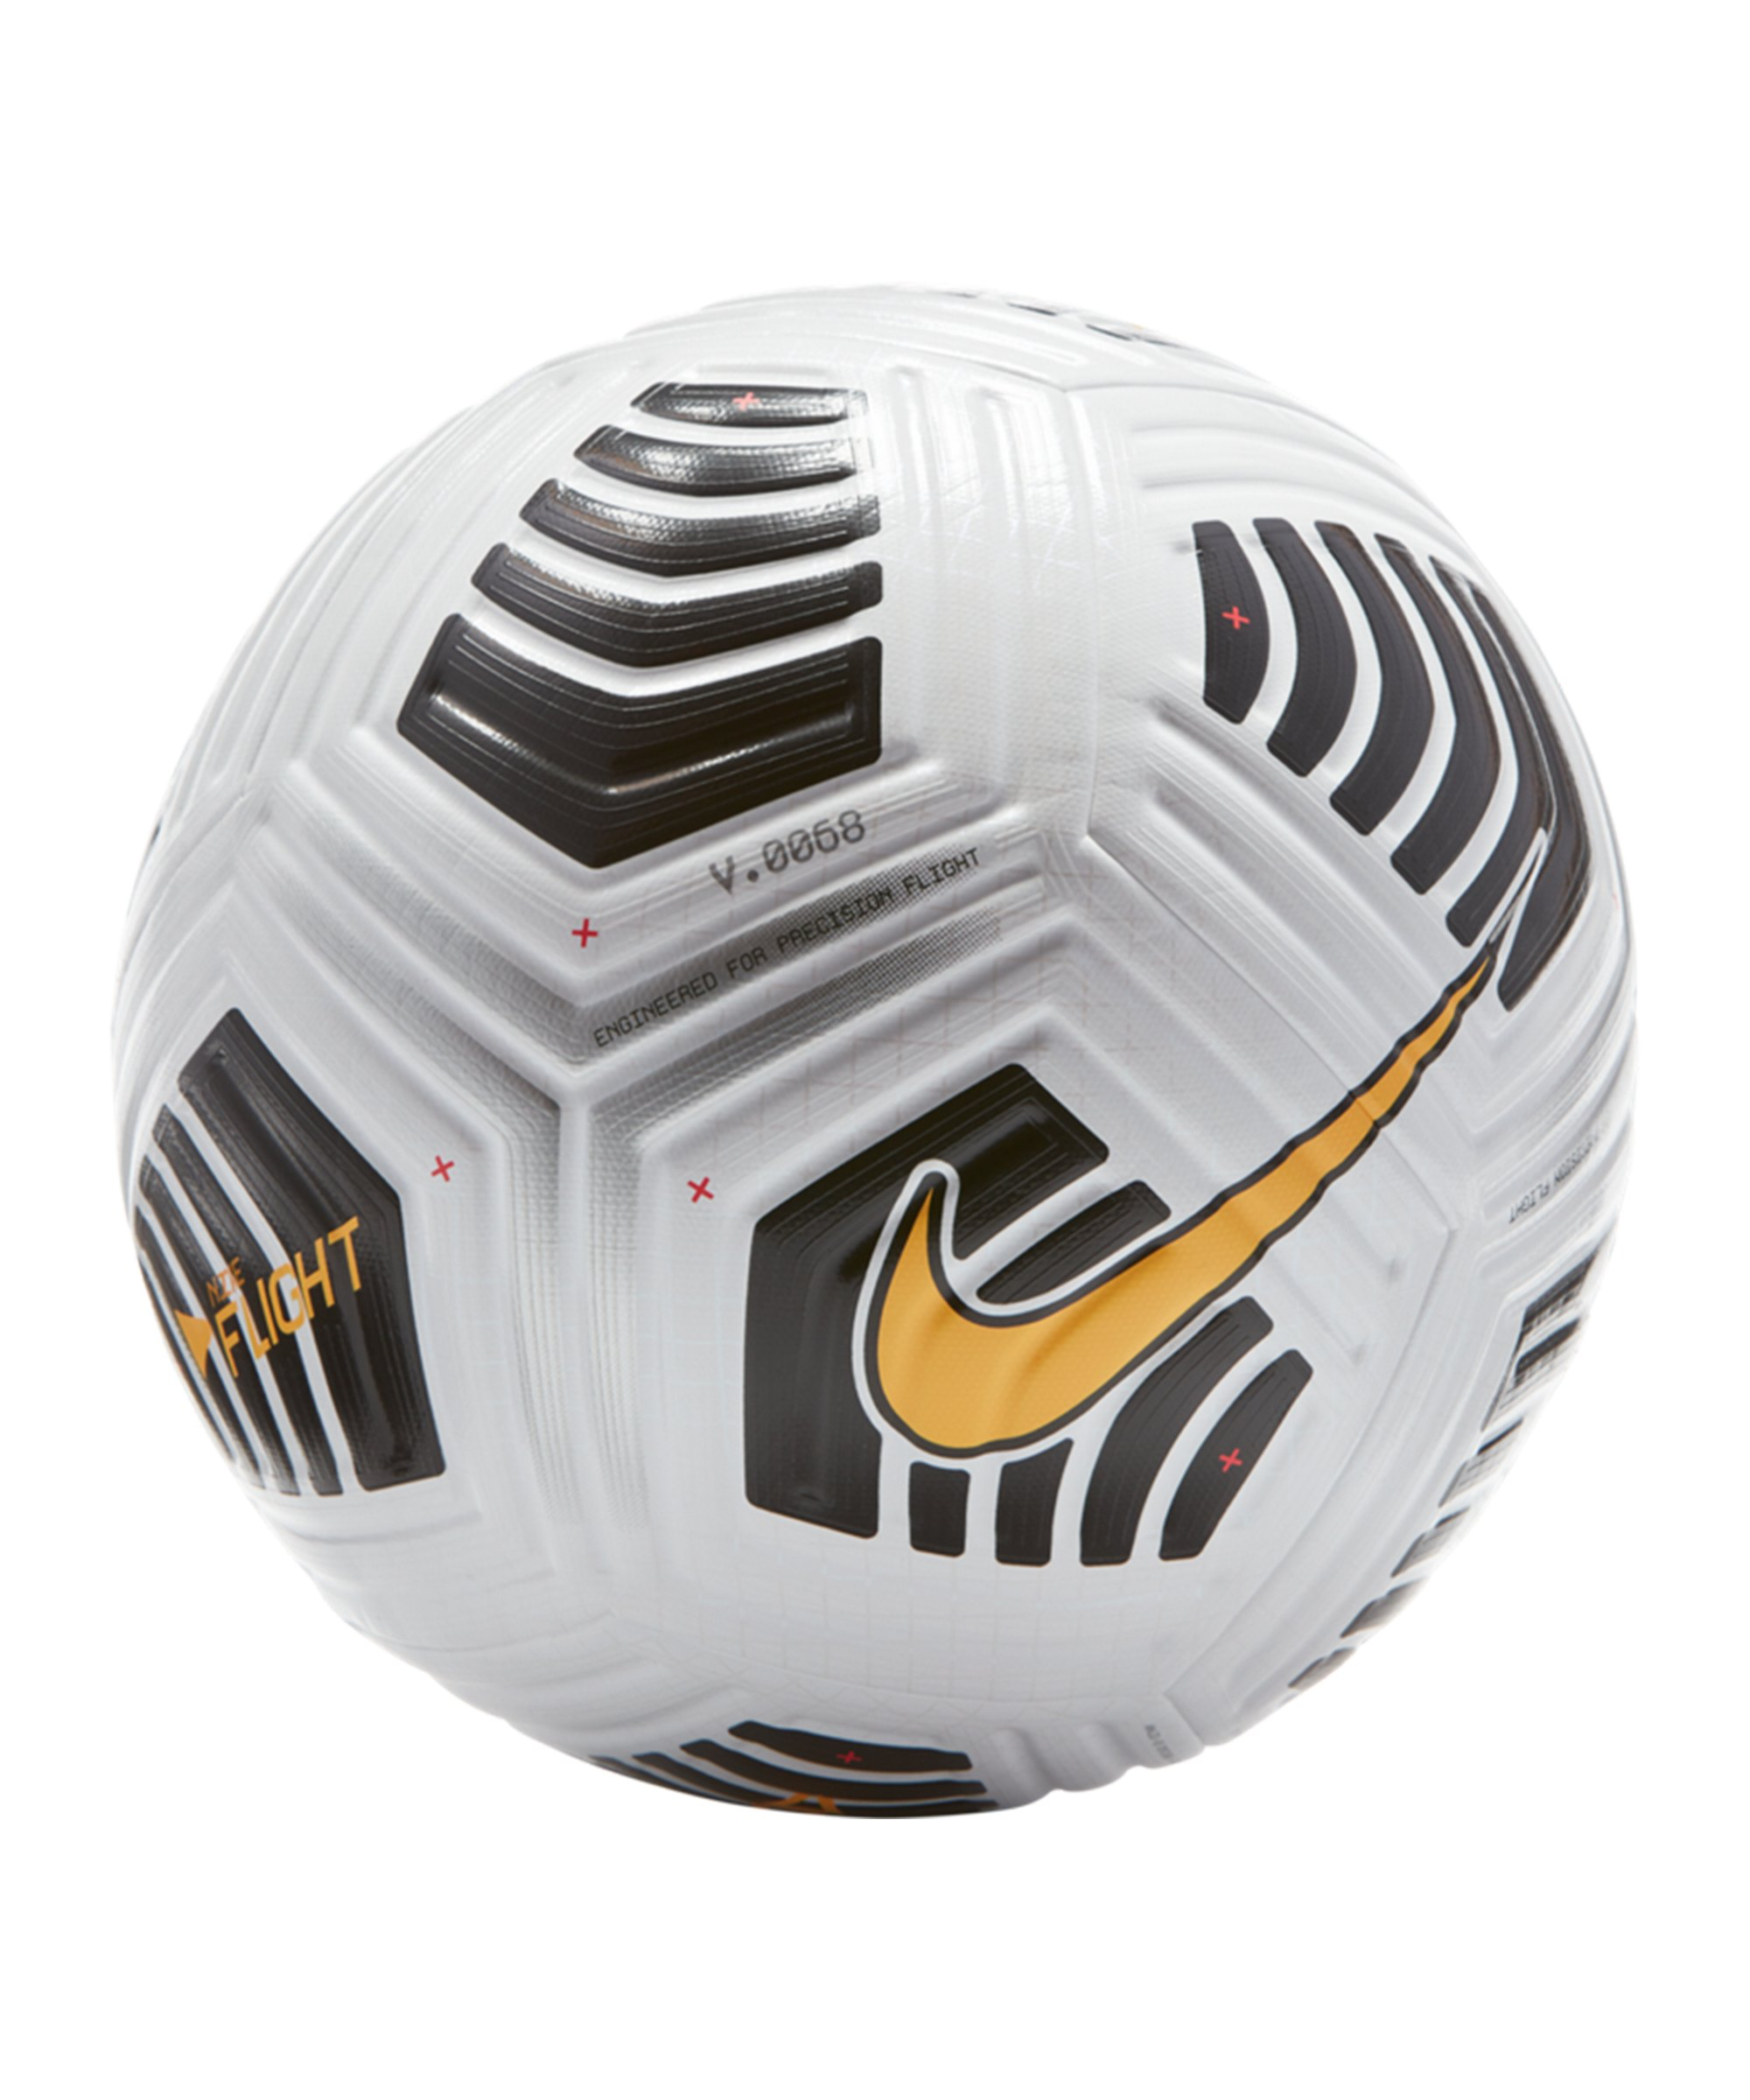 Nike Flight Ball Weiss Orange F100 - weiss